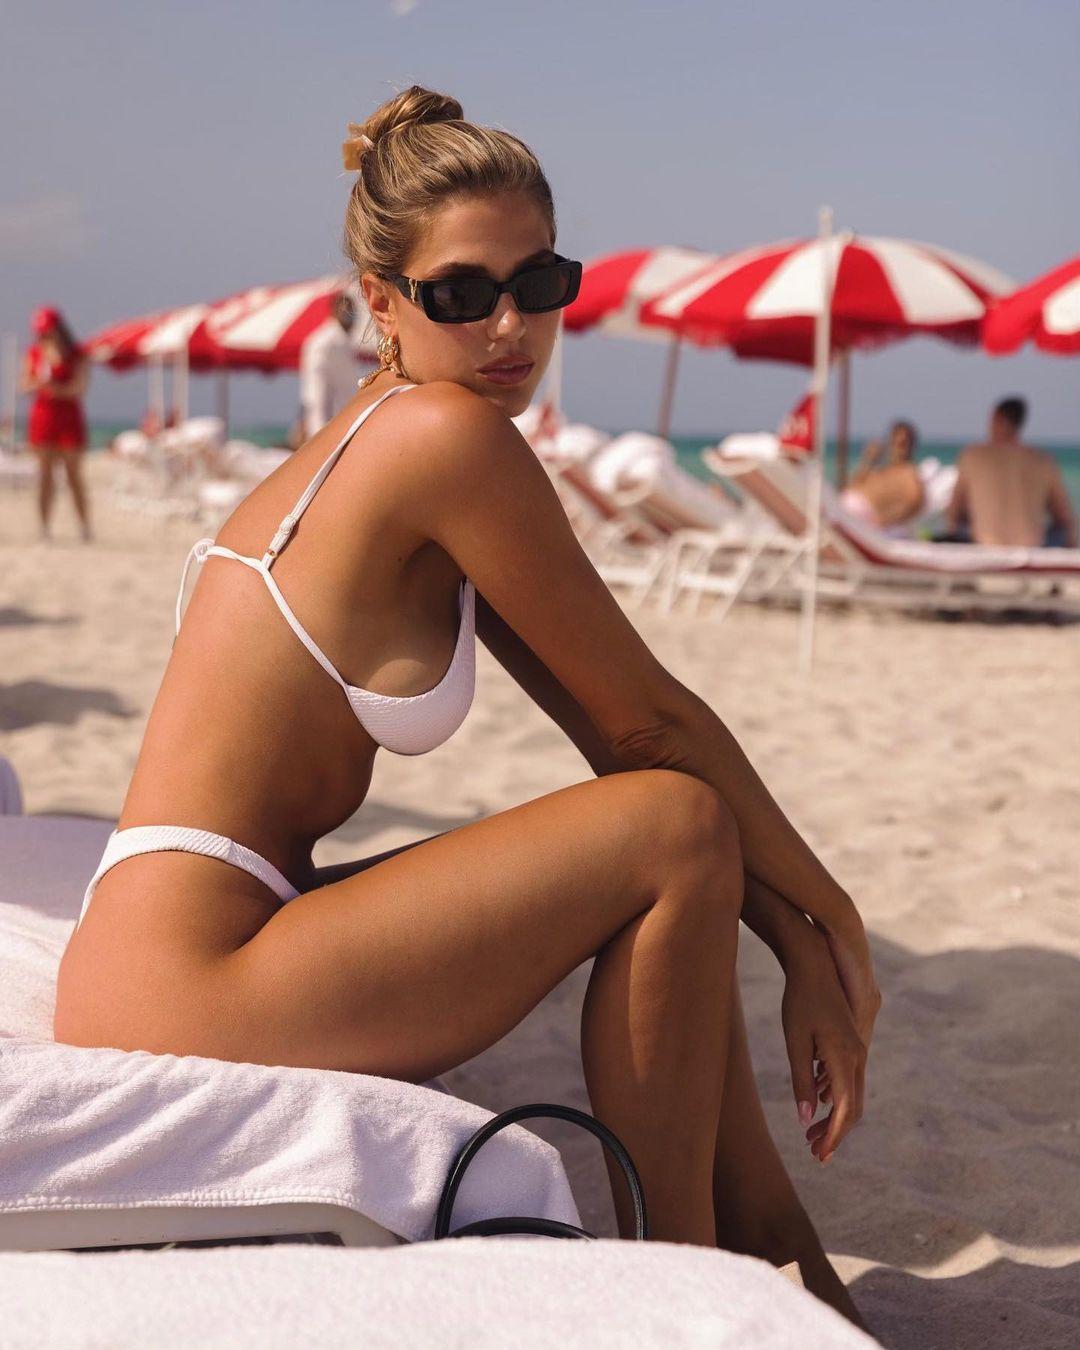 Kara-Del-Toro-Boobs-in-Bikini-2-1-thefappeningblog.com5_.jpg